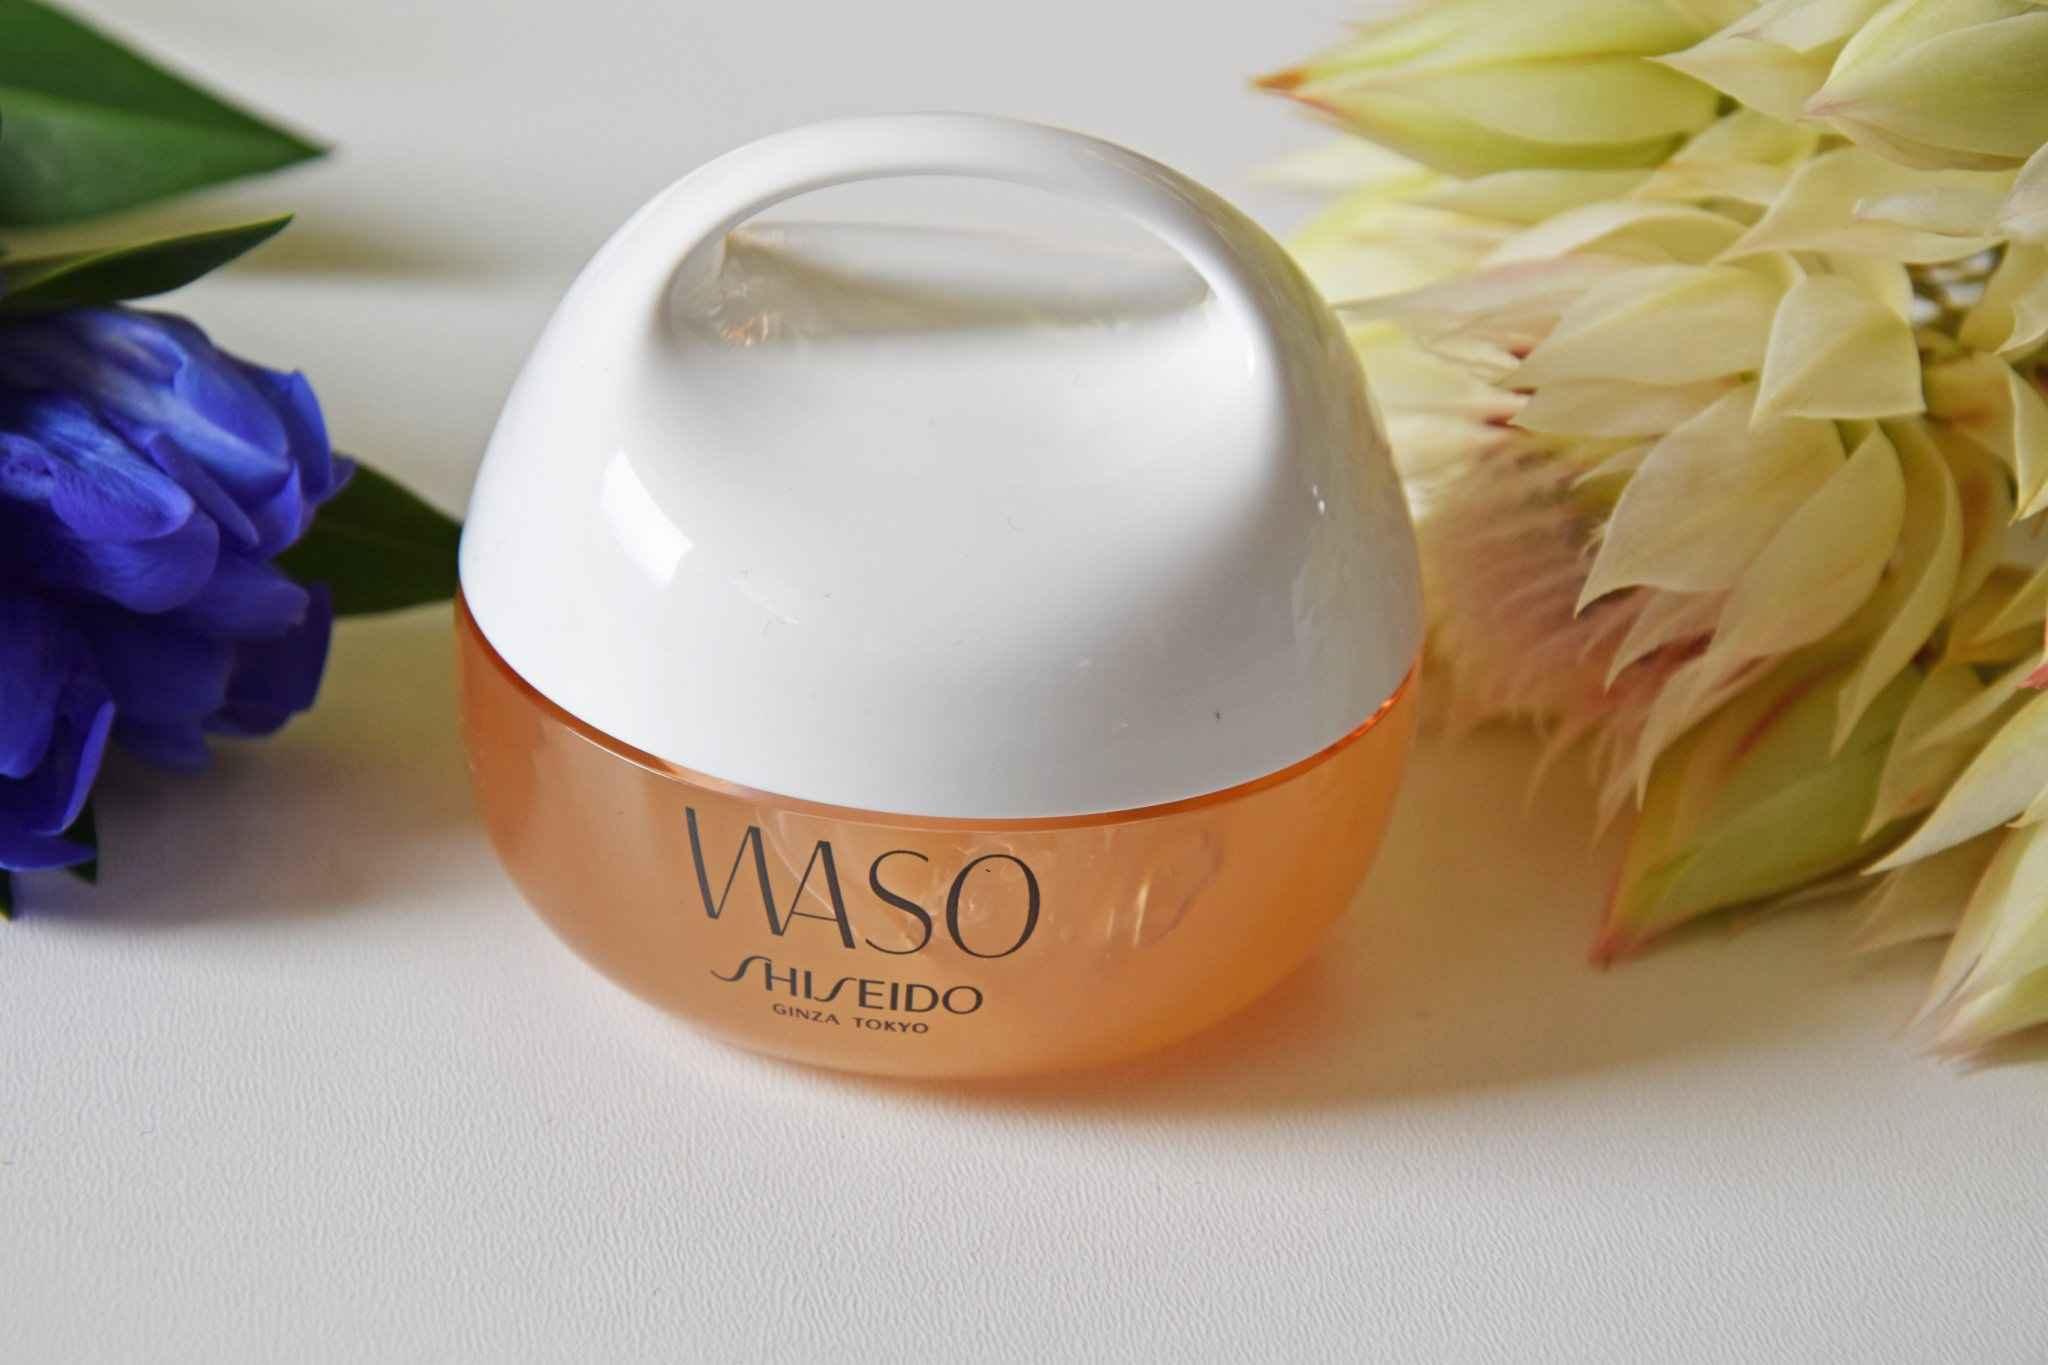 Shiseido - WASO:Clear Mega-hydrating Cream